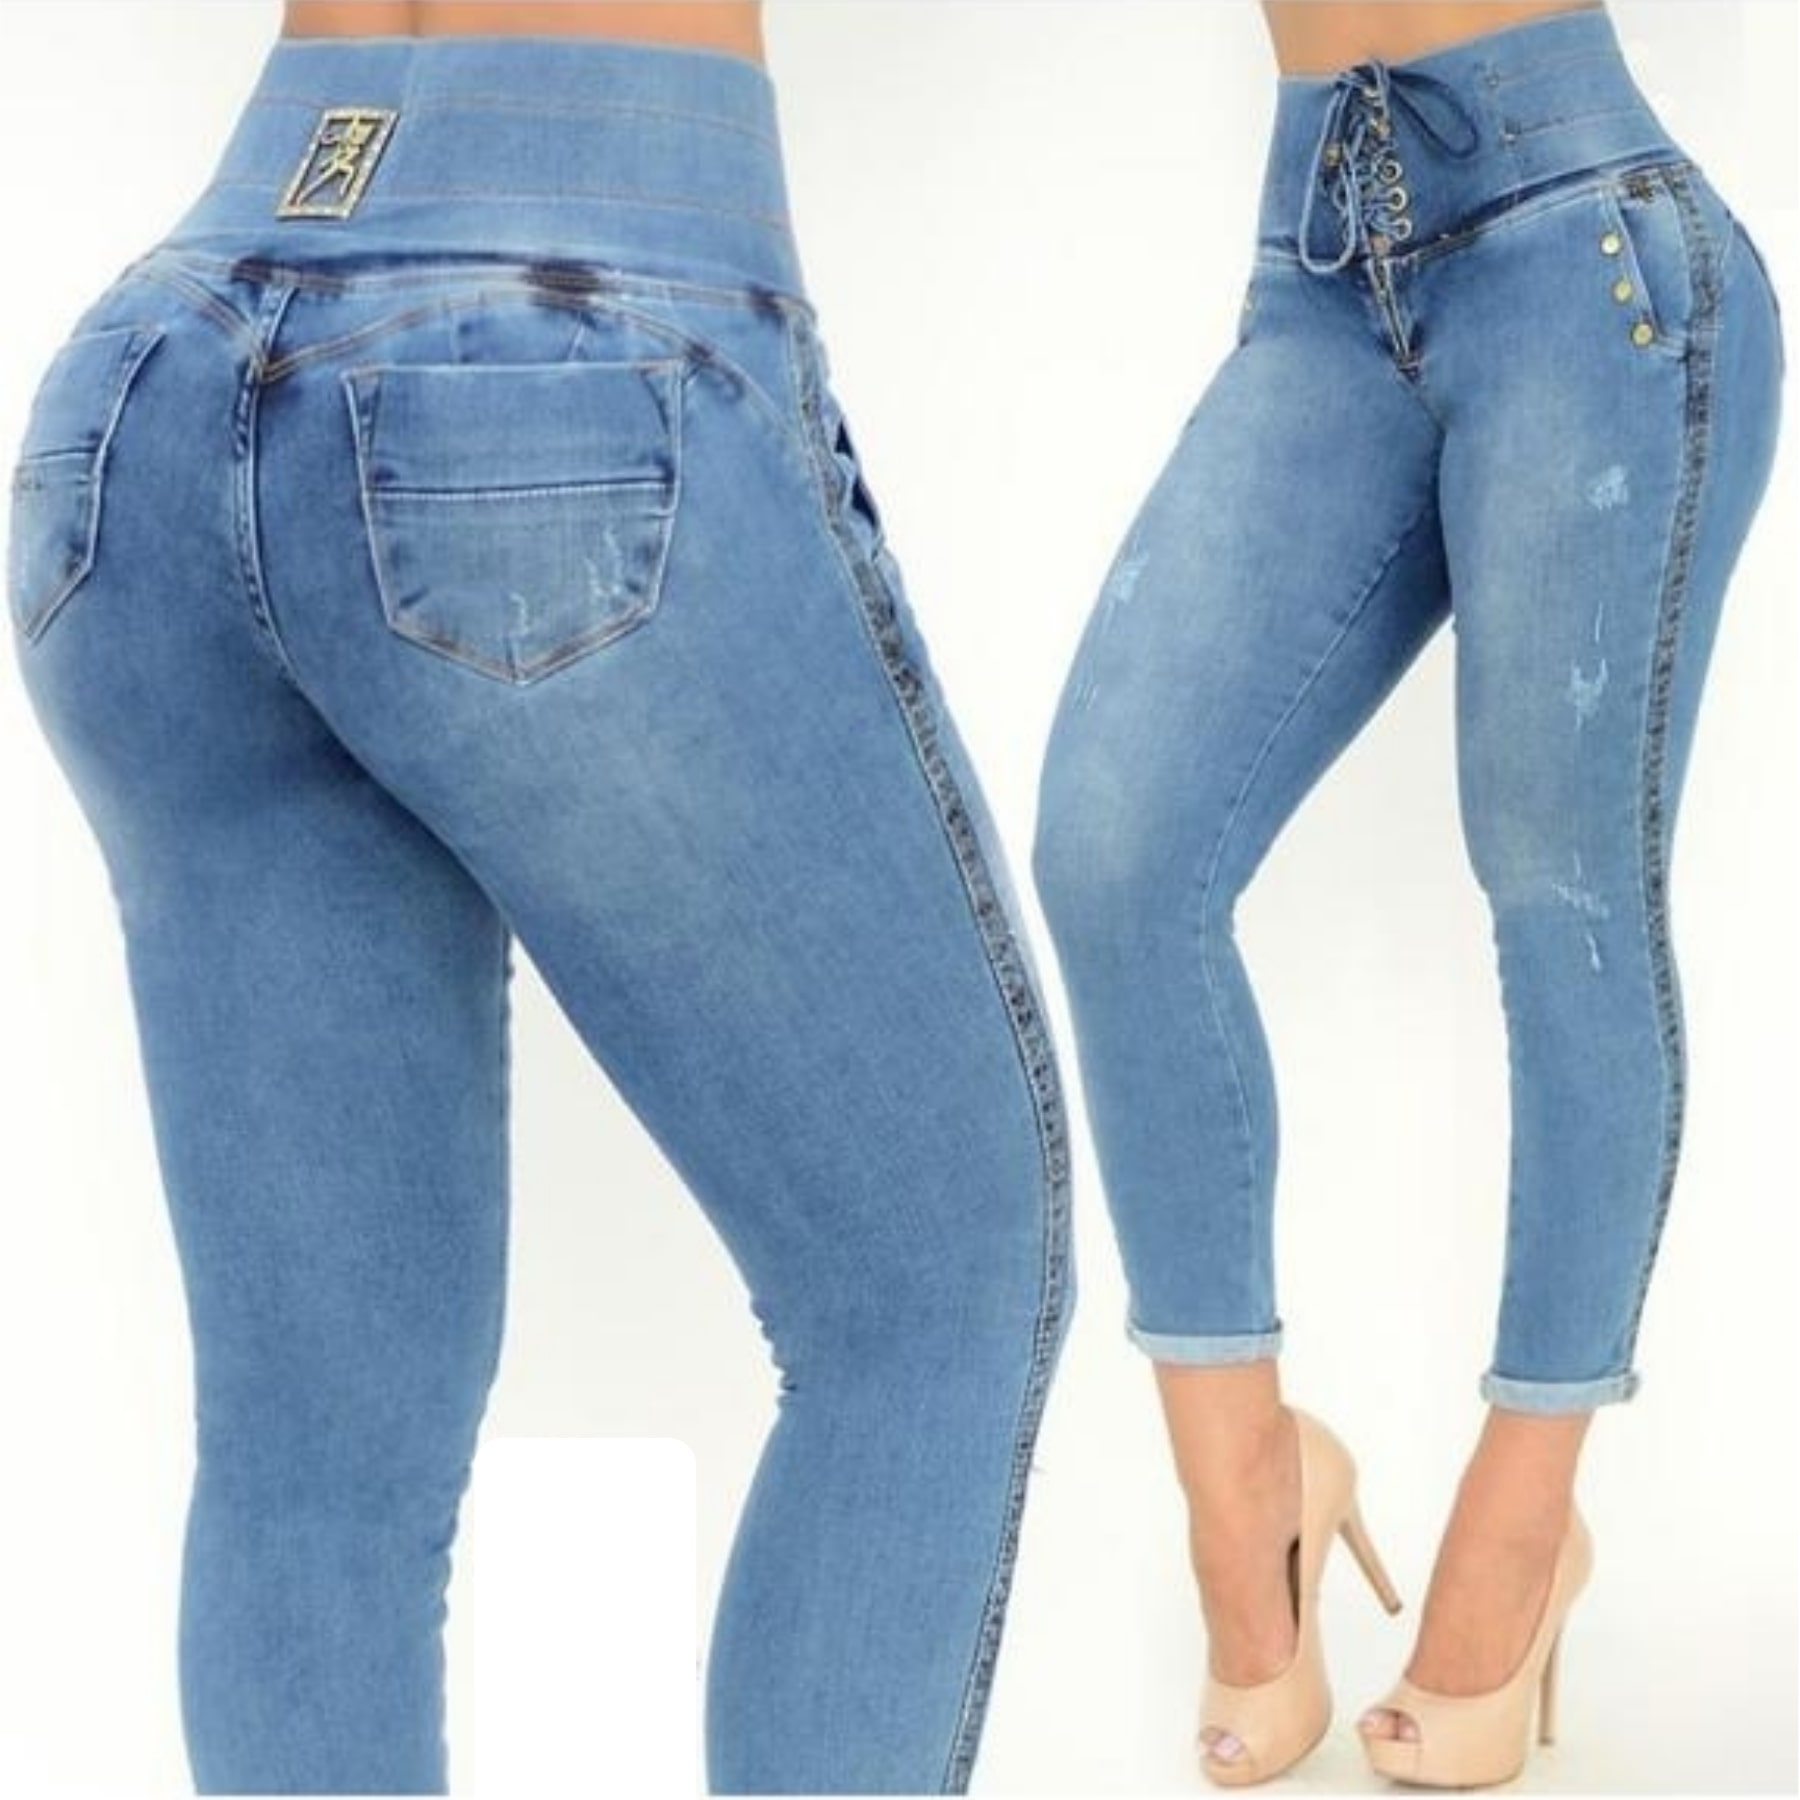 Calça Jeans Feminina Cropped Clochard Rhero Jeans